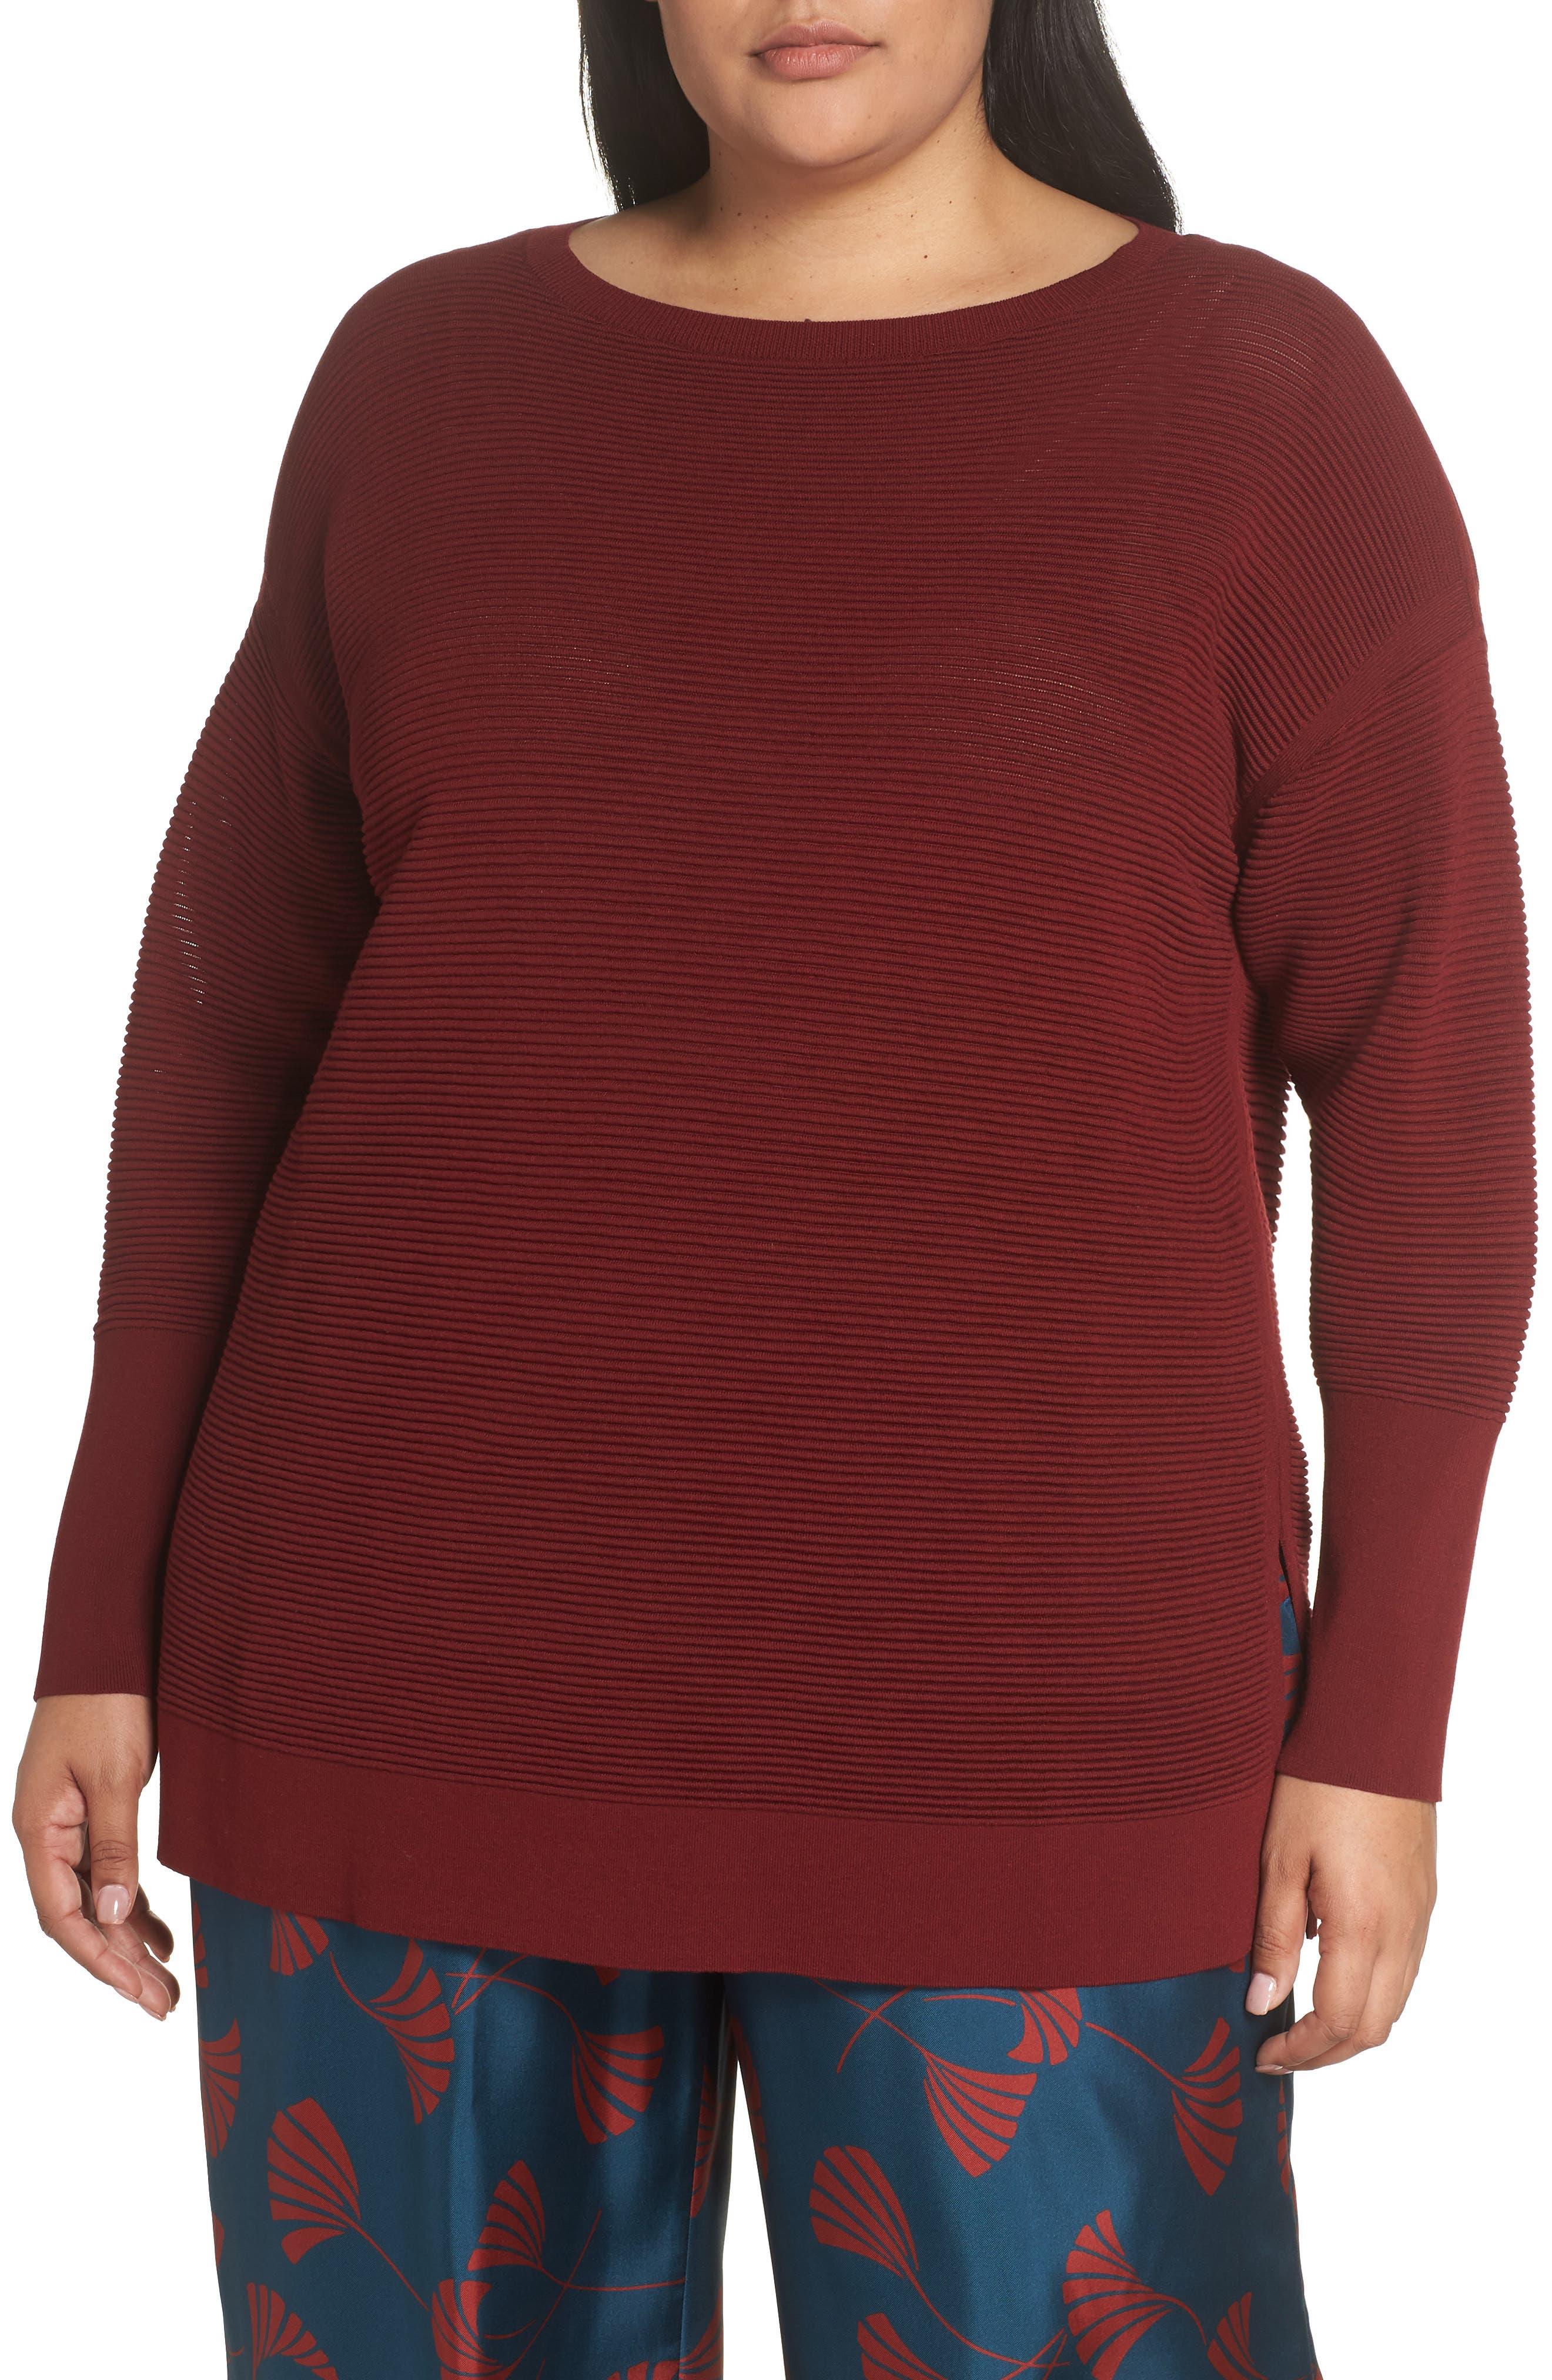 LAFAYETTE 148 NEW YORK Bateau Neck Matte Crepe Sweater, Main, color, 601